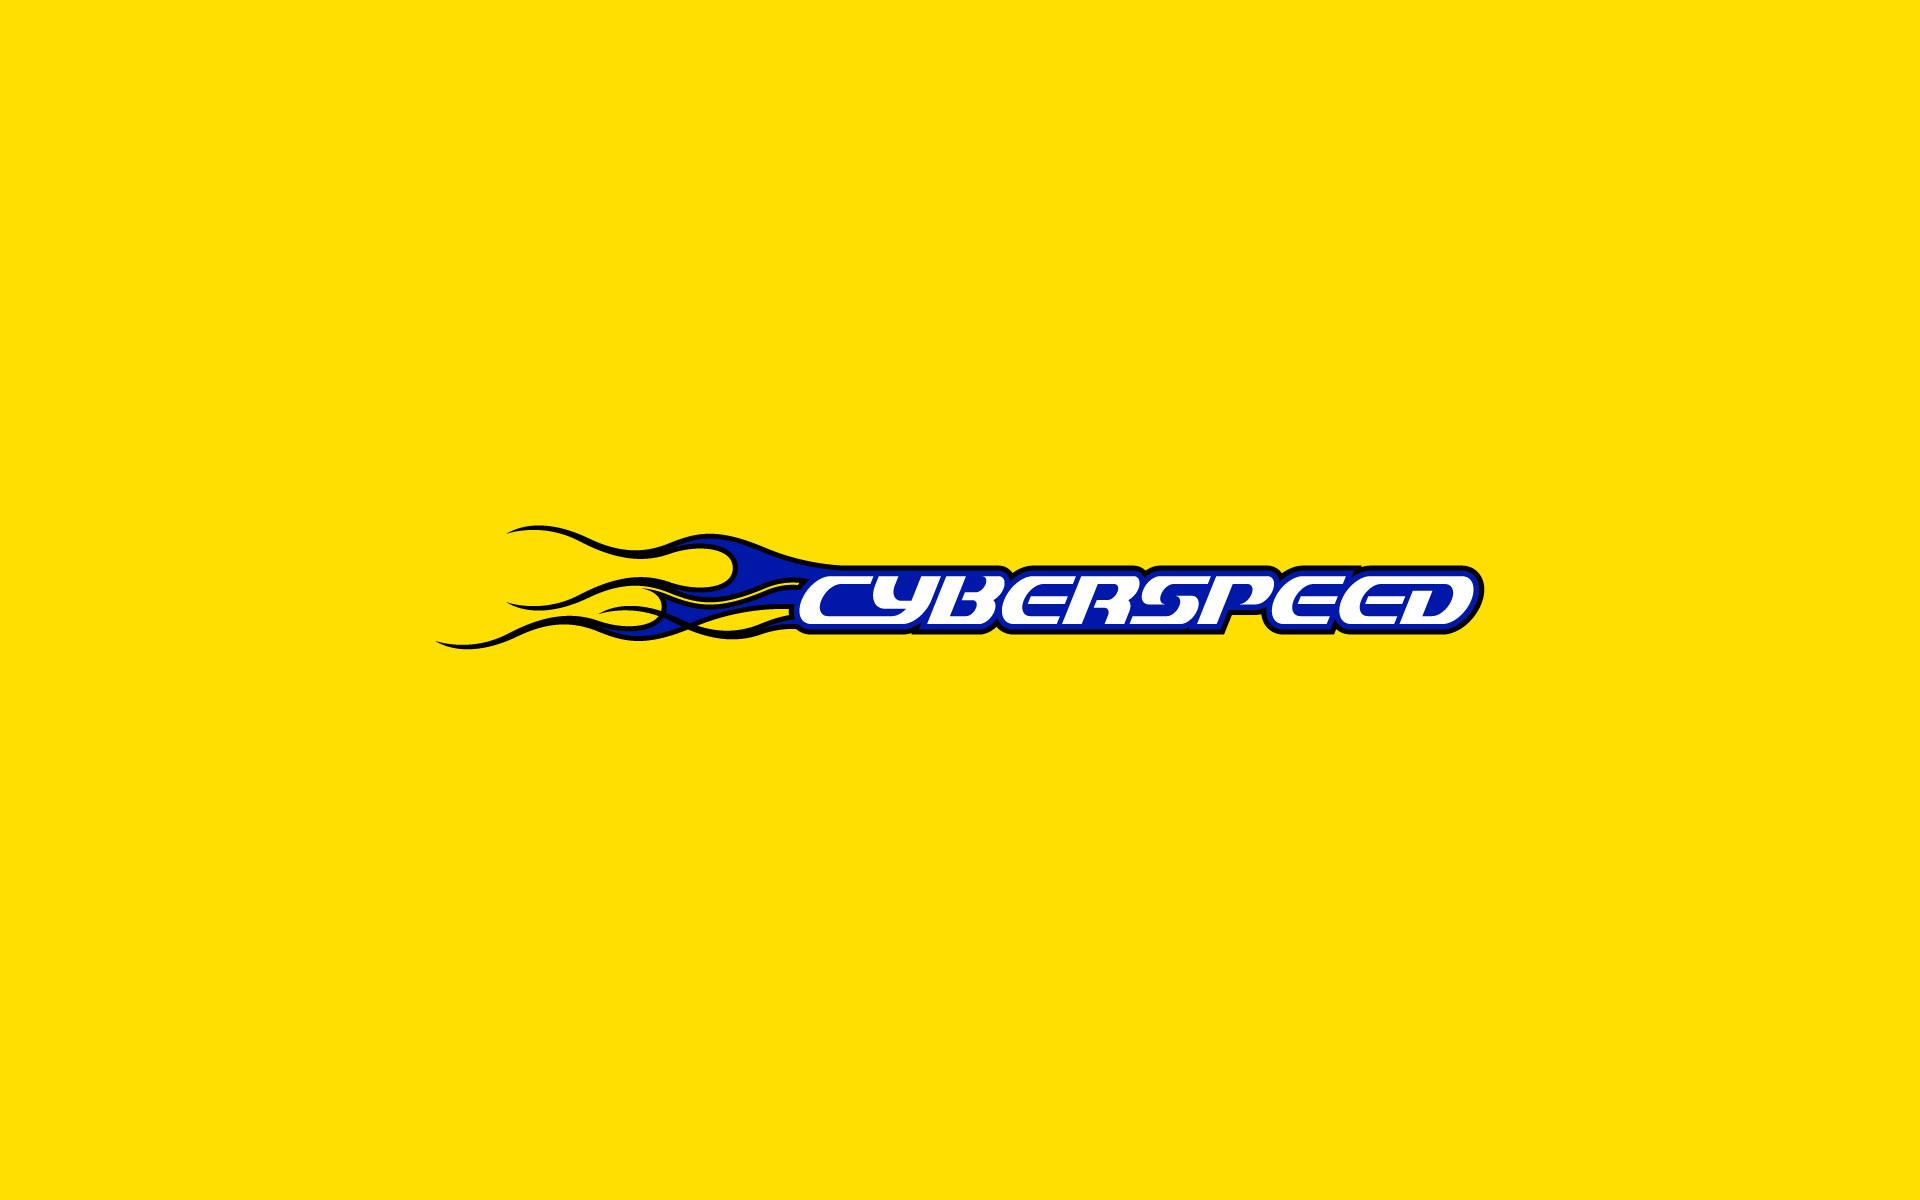 Cyberspeed Racing Brand Identity